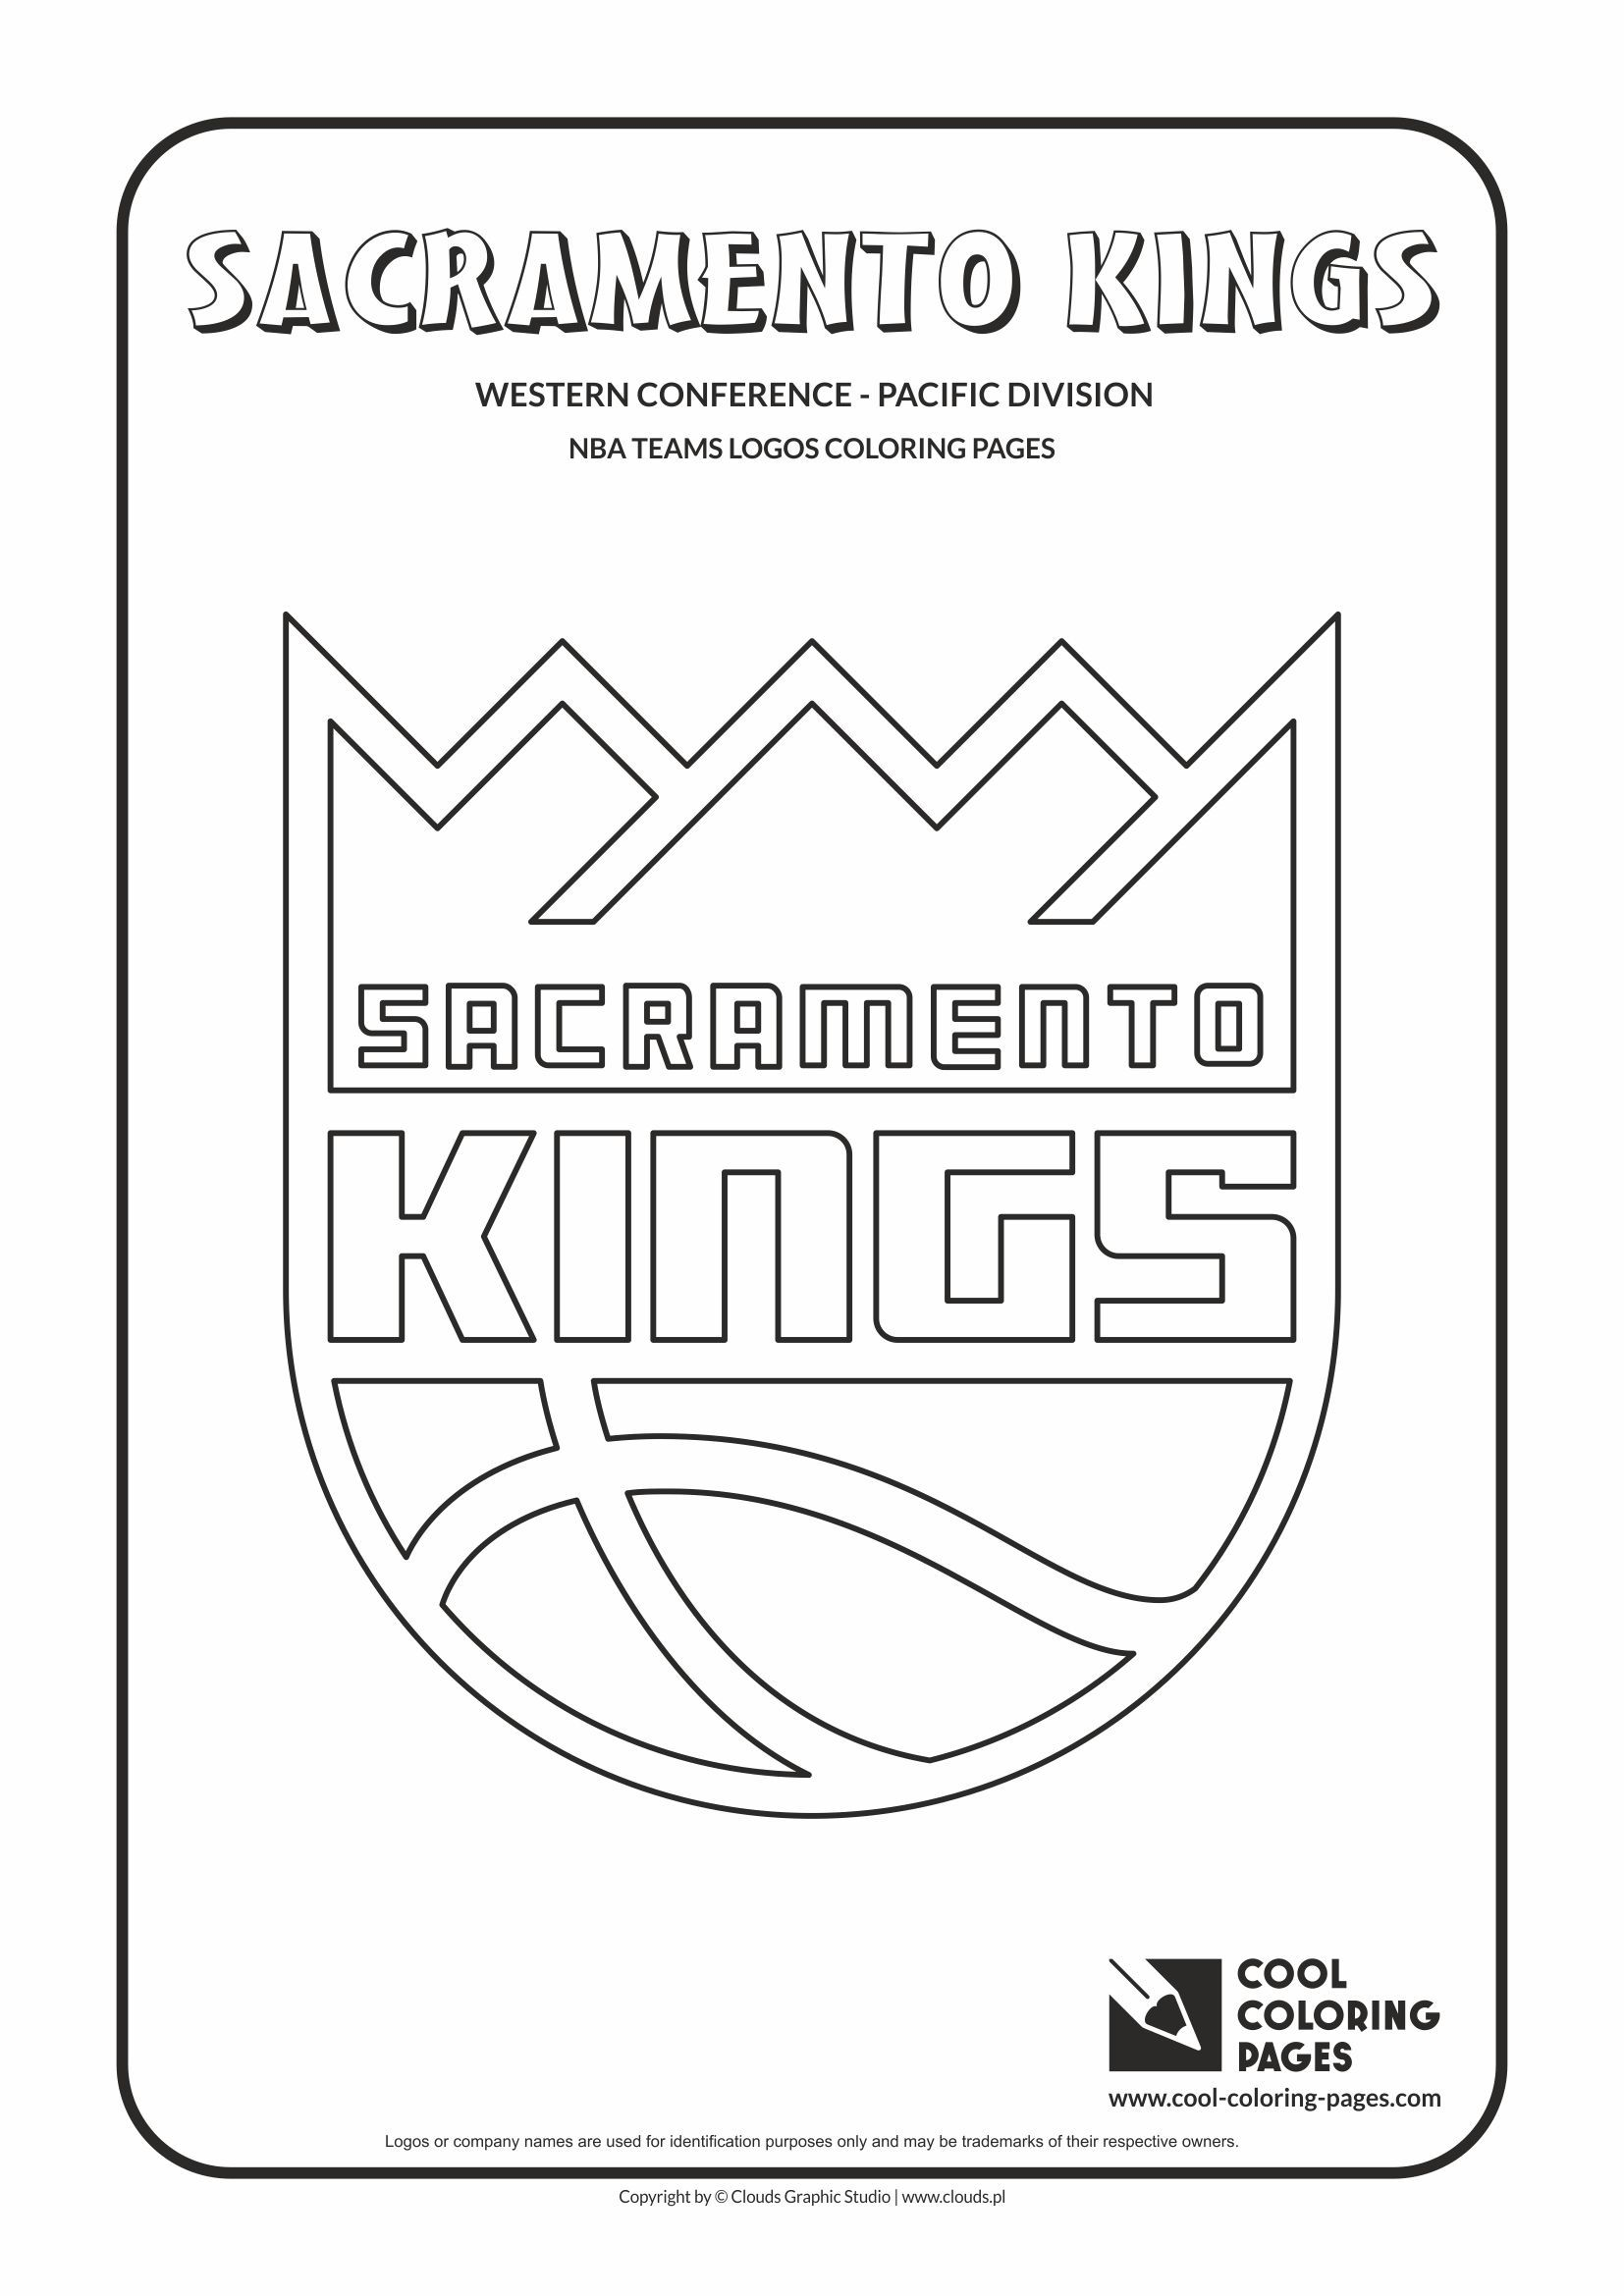 Sacramento Kings Nba Basketball Teams Logos Coloring Pages